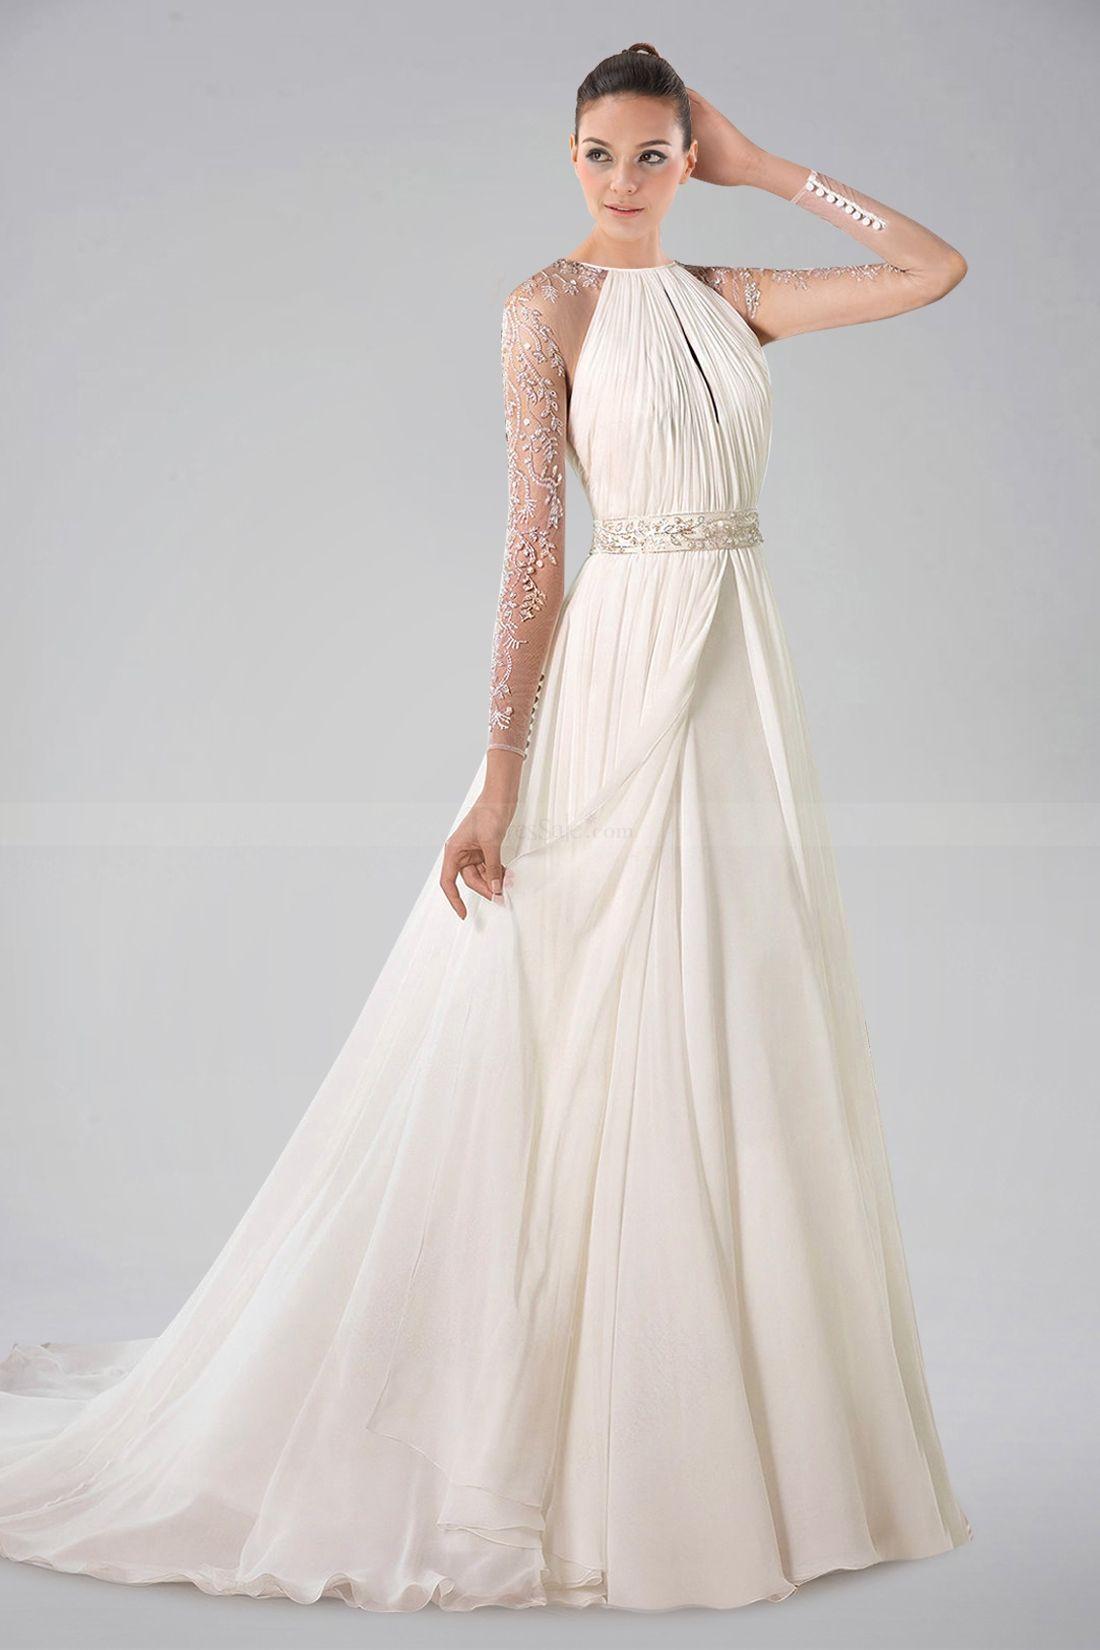 Long sleeve chiffon wedding dress  Luxurious Long Illusion Sleeve Chiffon Wedding Gown with Pleats and